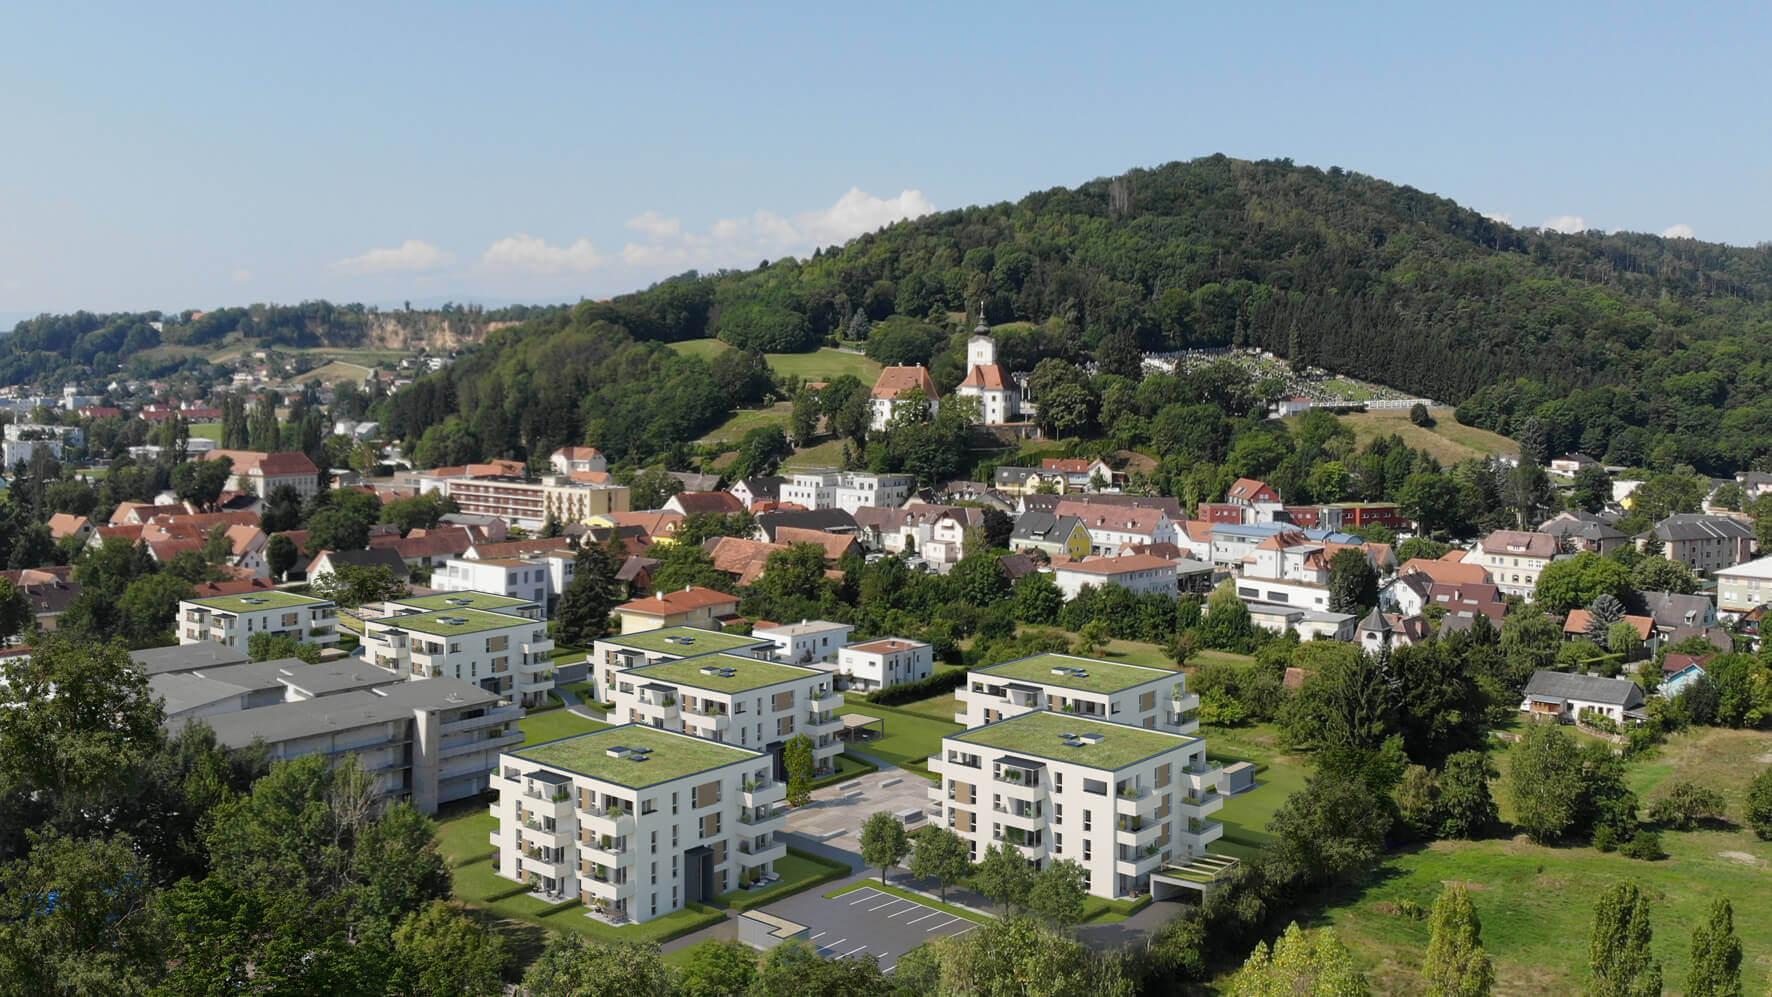 Neubauherrenmodell - 186 Grad Wohnensemble Graz Süd